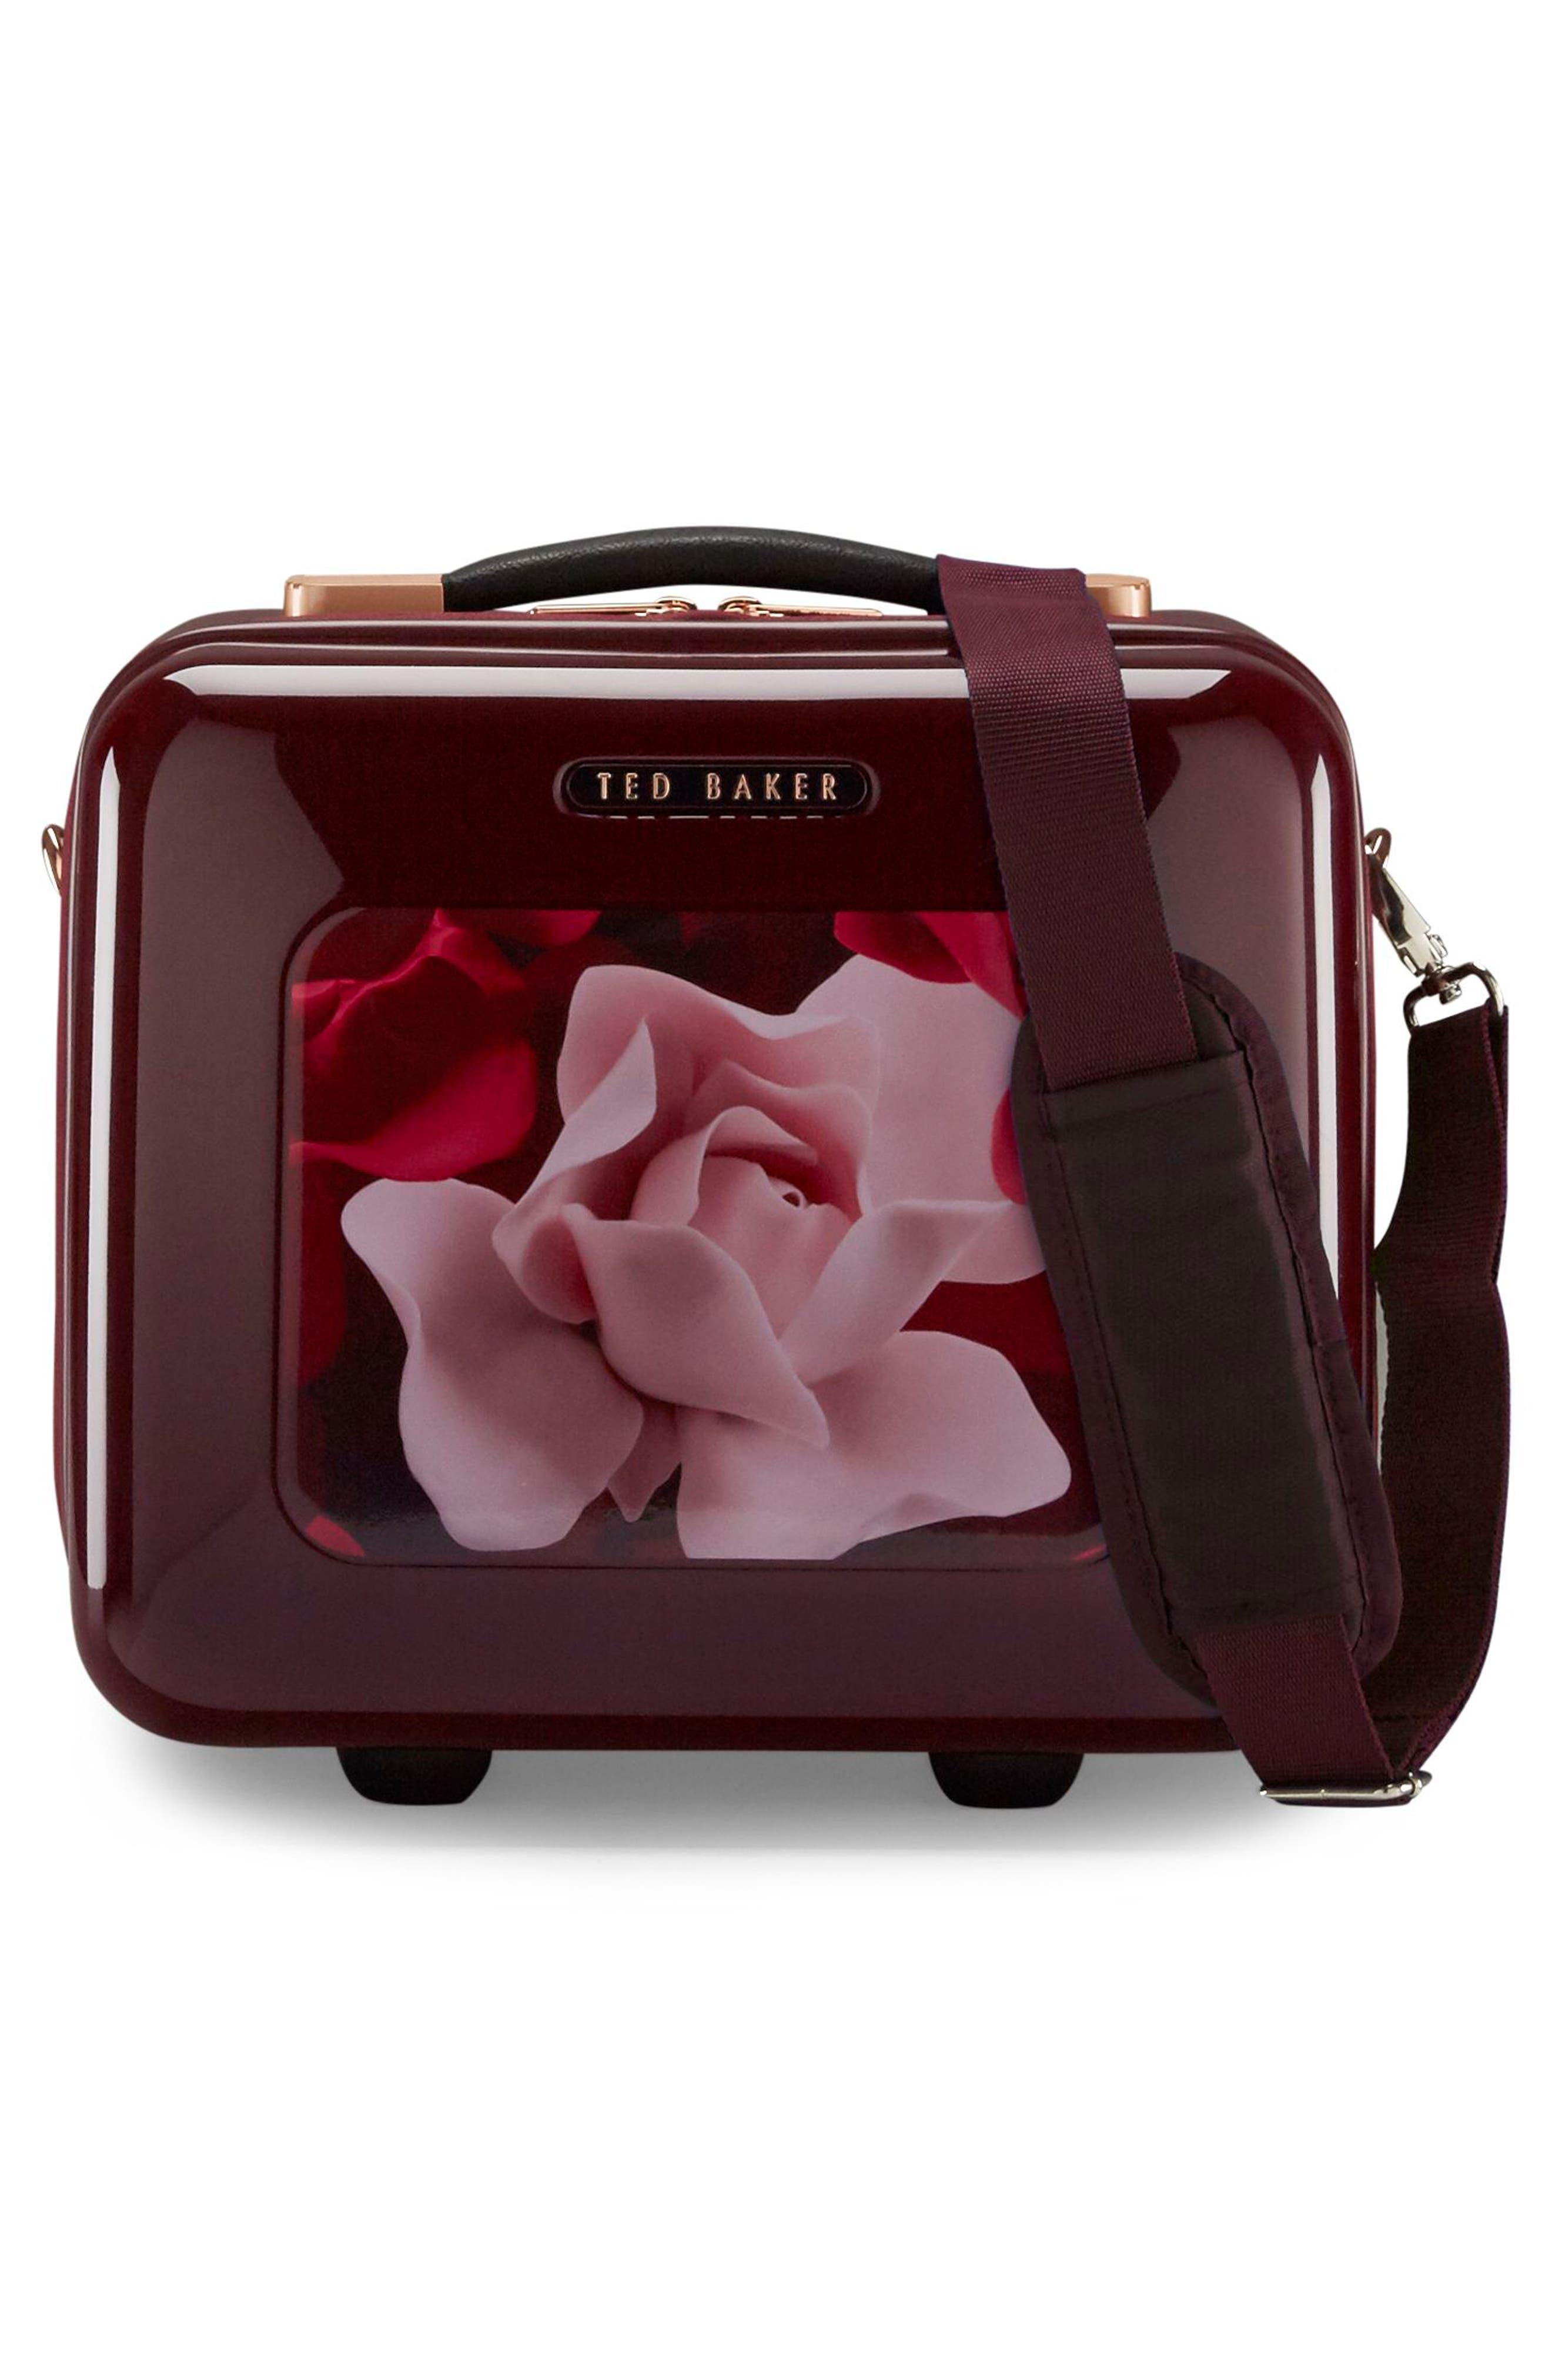 Porcelain Rose Vanity Case,                             Alternate thumbnail 5, color,                             Burgundy